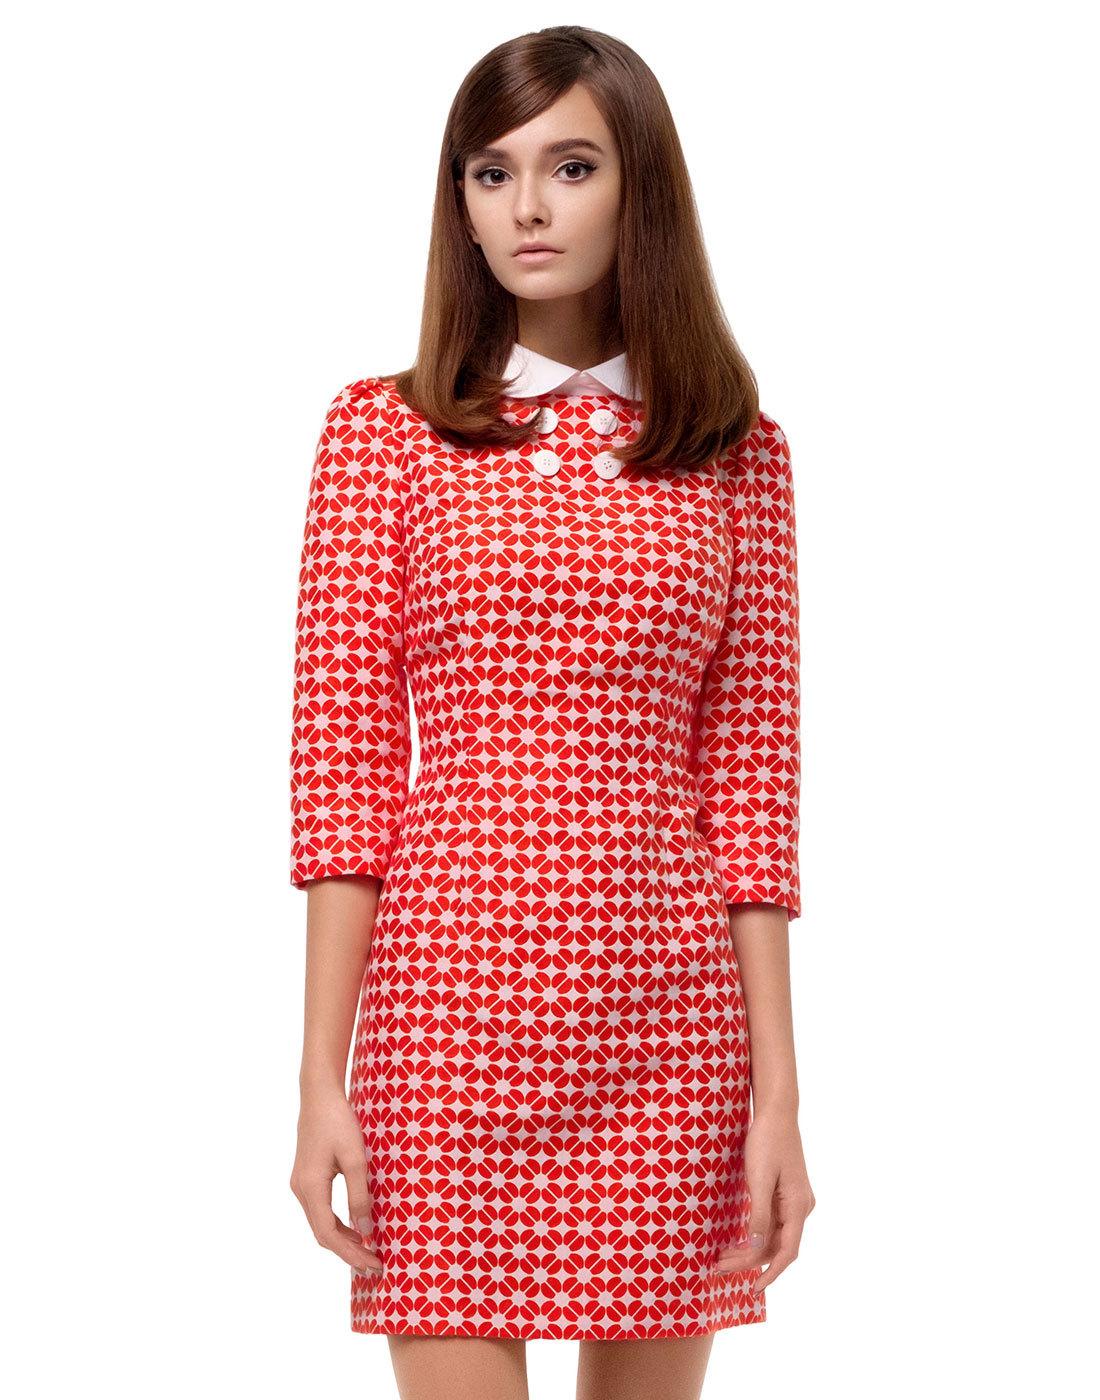 MARMALADE 60s Mod Geometric Flower Fitted Dress